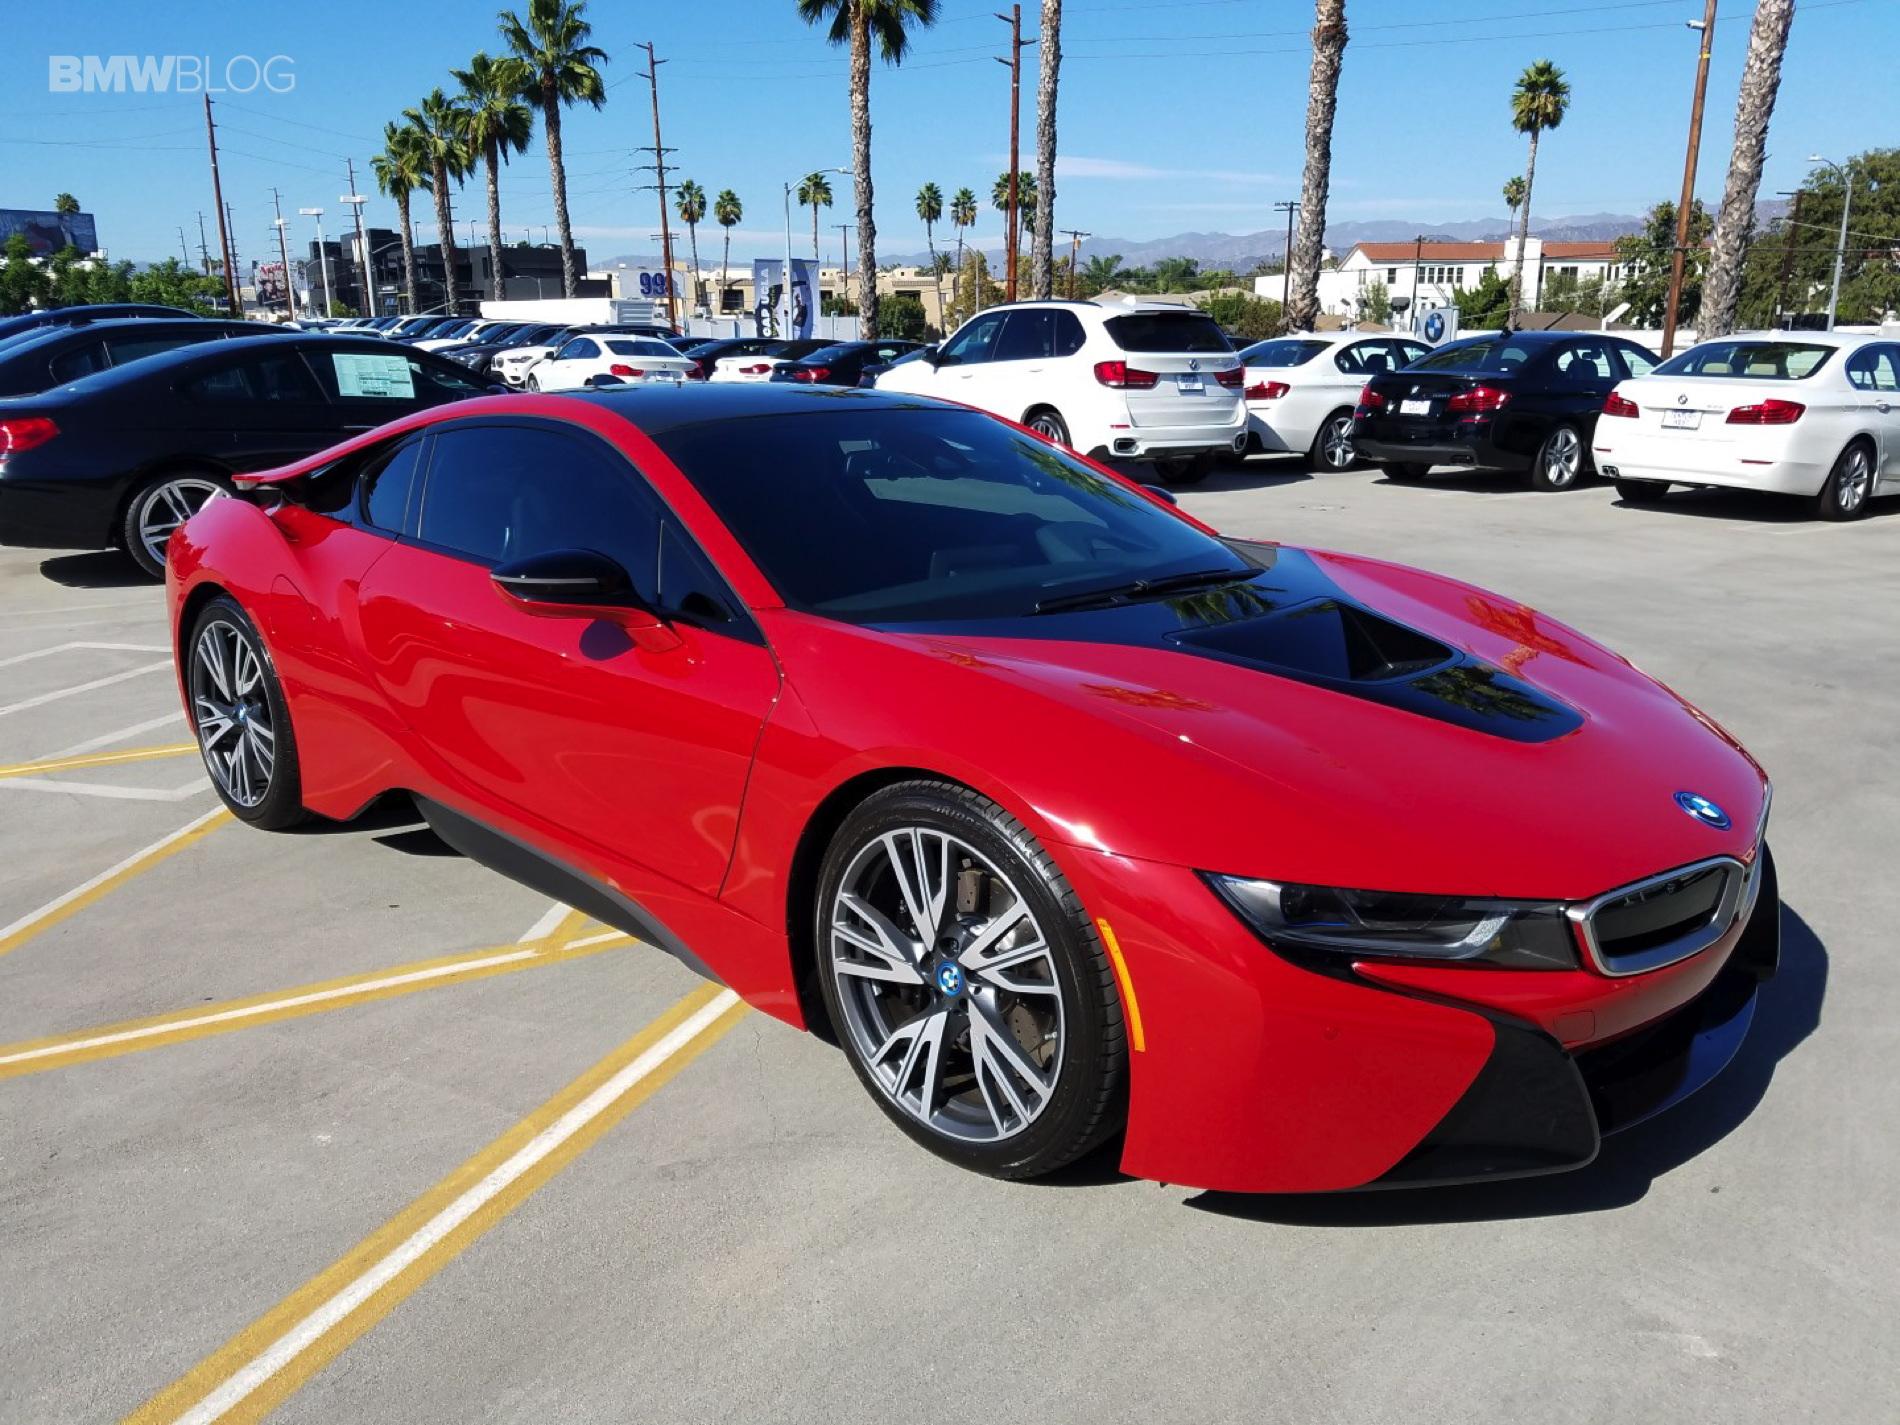 BMW i8 Protonic Red century west 3